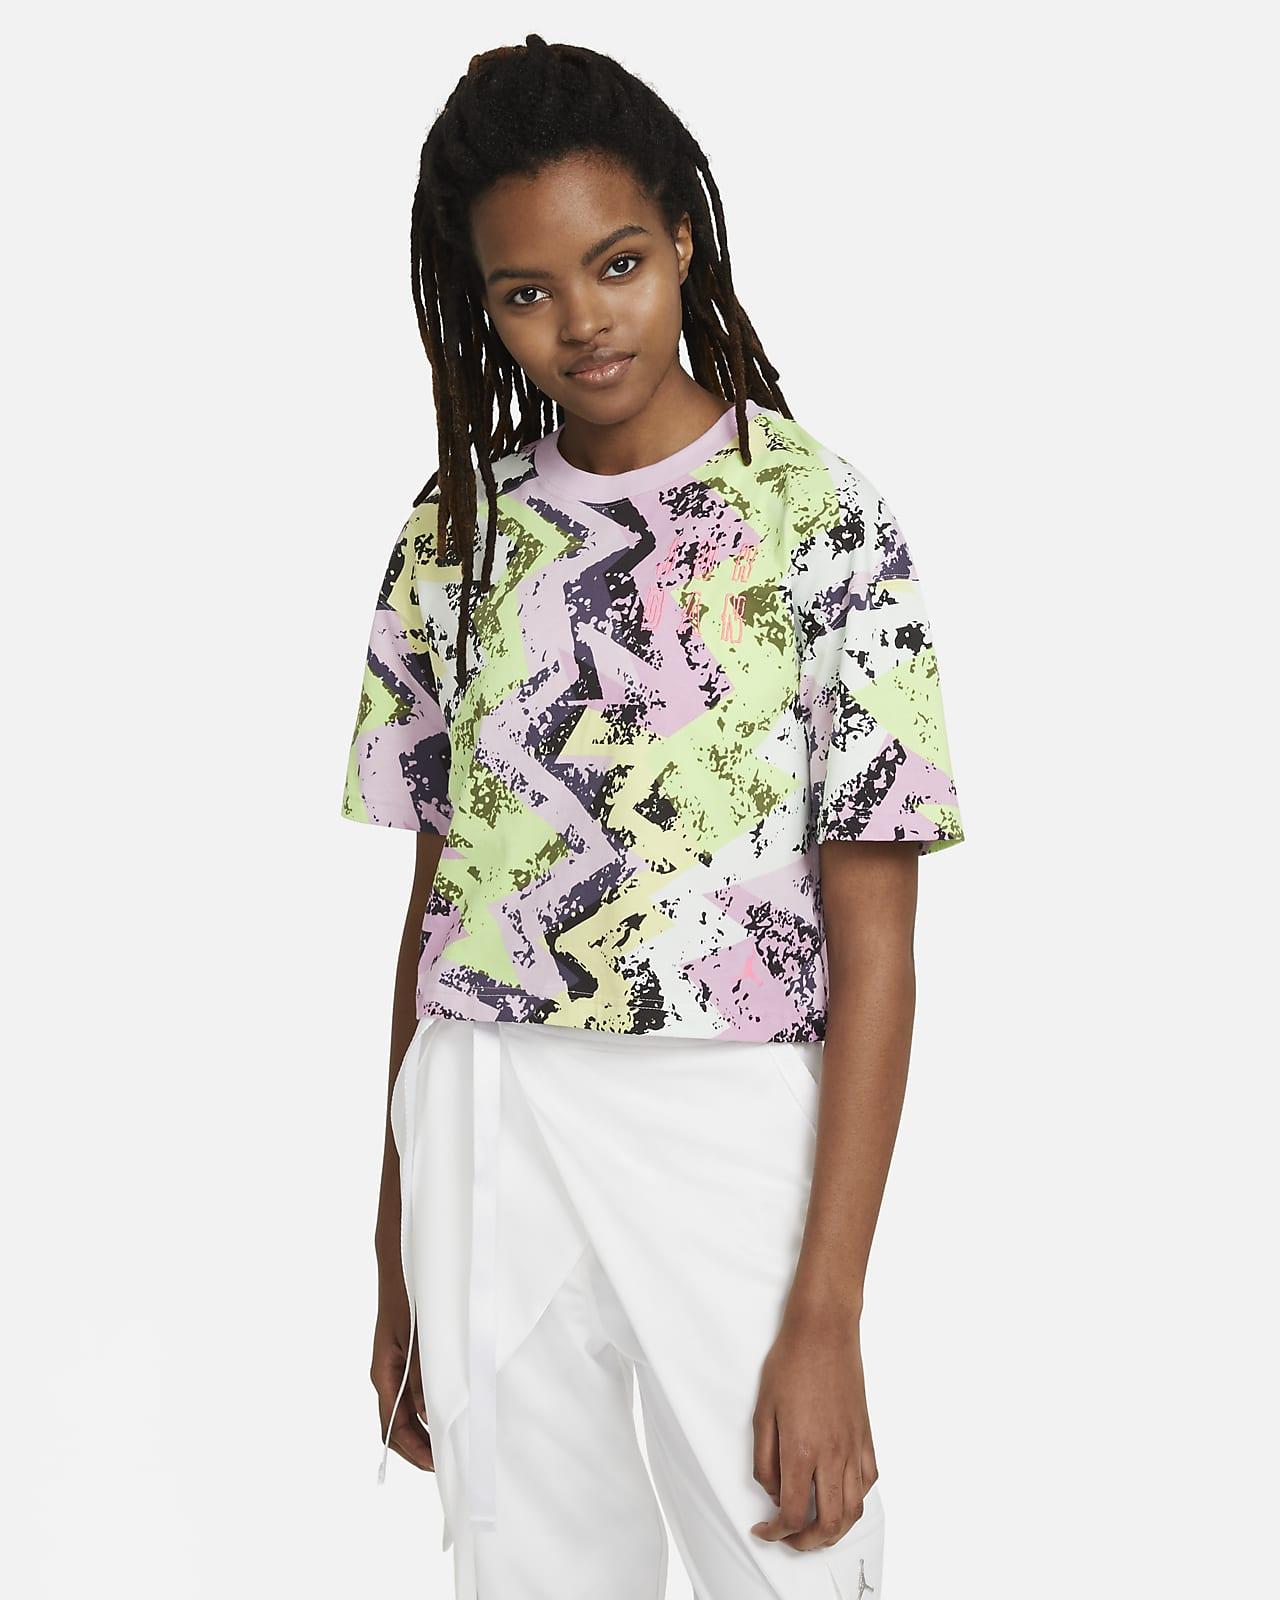 Jordan Heatwave szögletes fazonú női póló